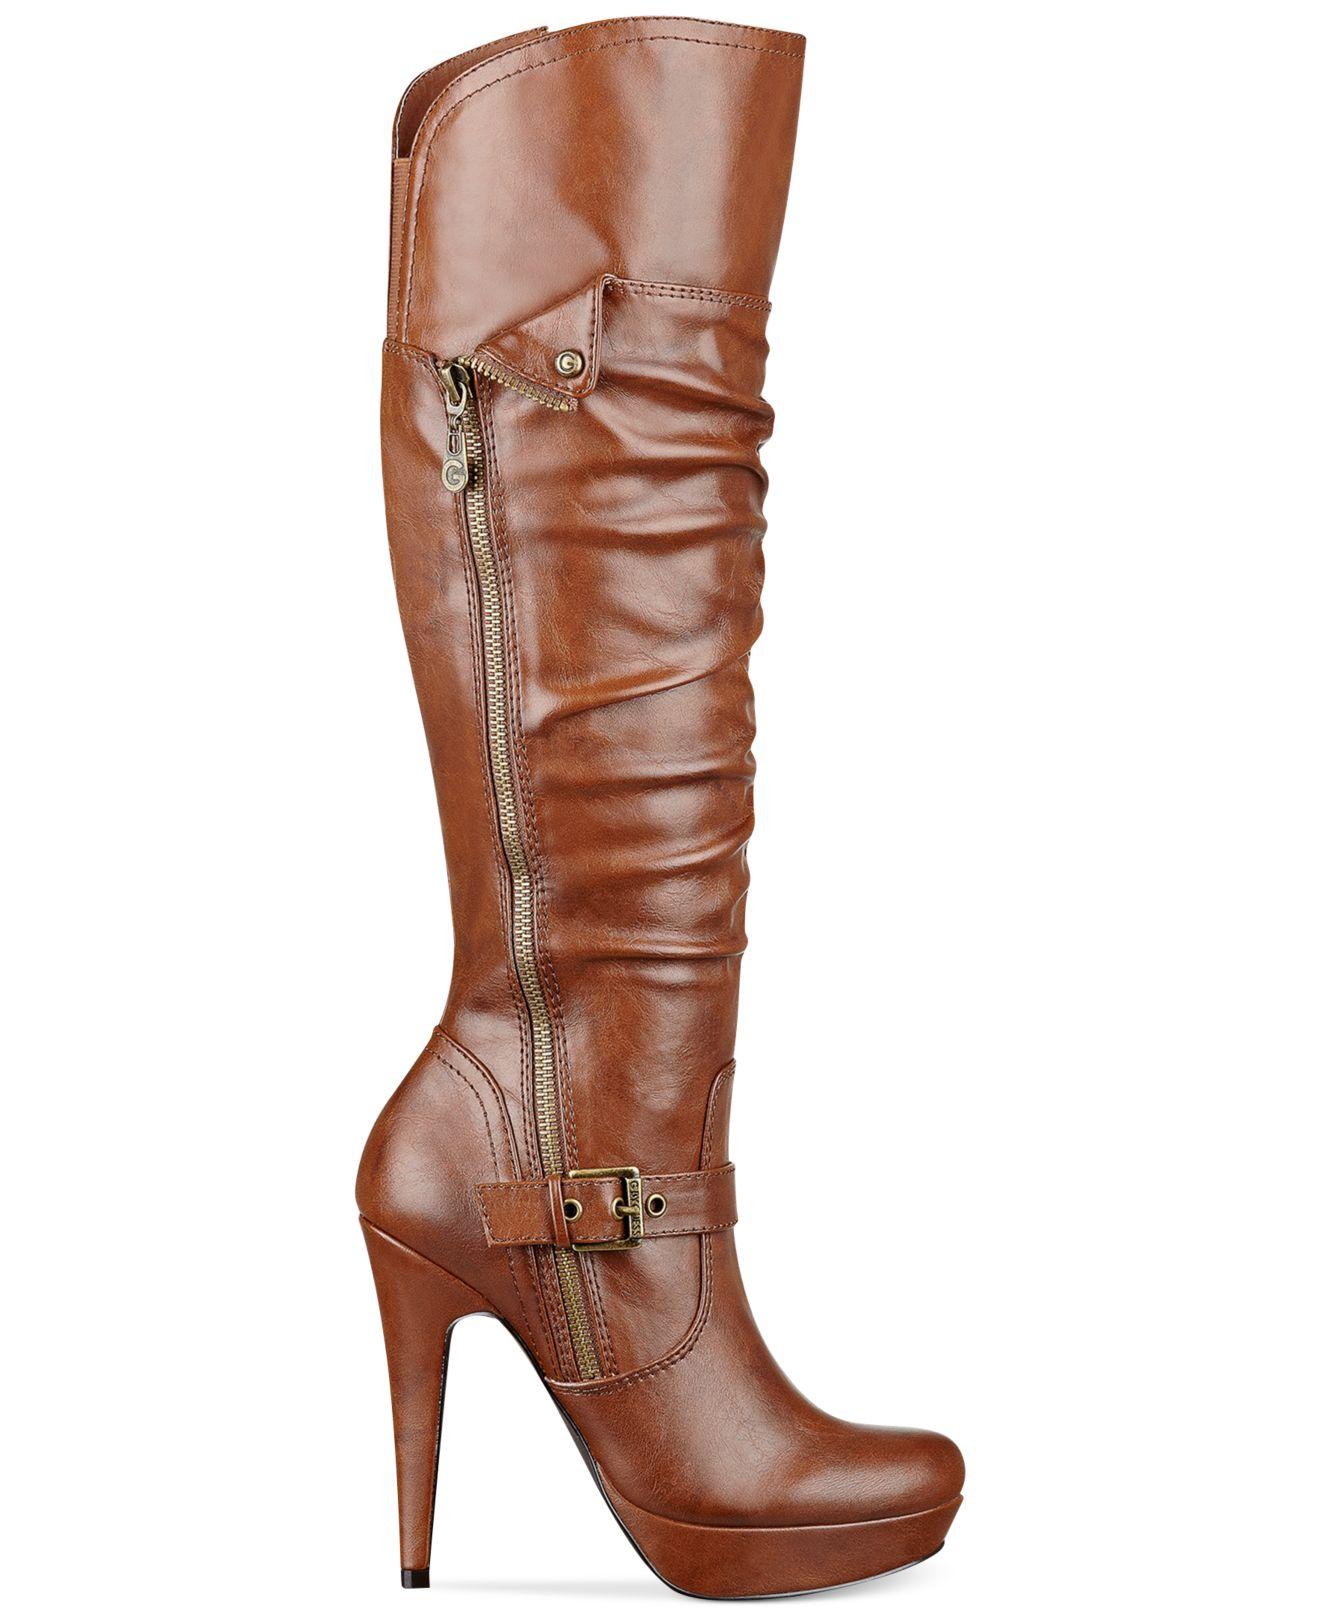 Excellent COLE HAAN City Womenu0026#39;s Brown Leather Dress Fashion Ankle Boots Shoes 7 B M - Womenu0026#39;s Shoes